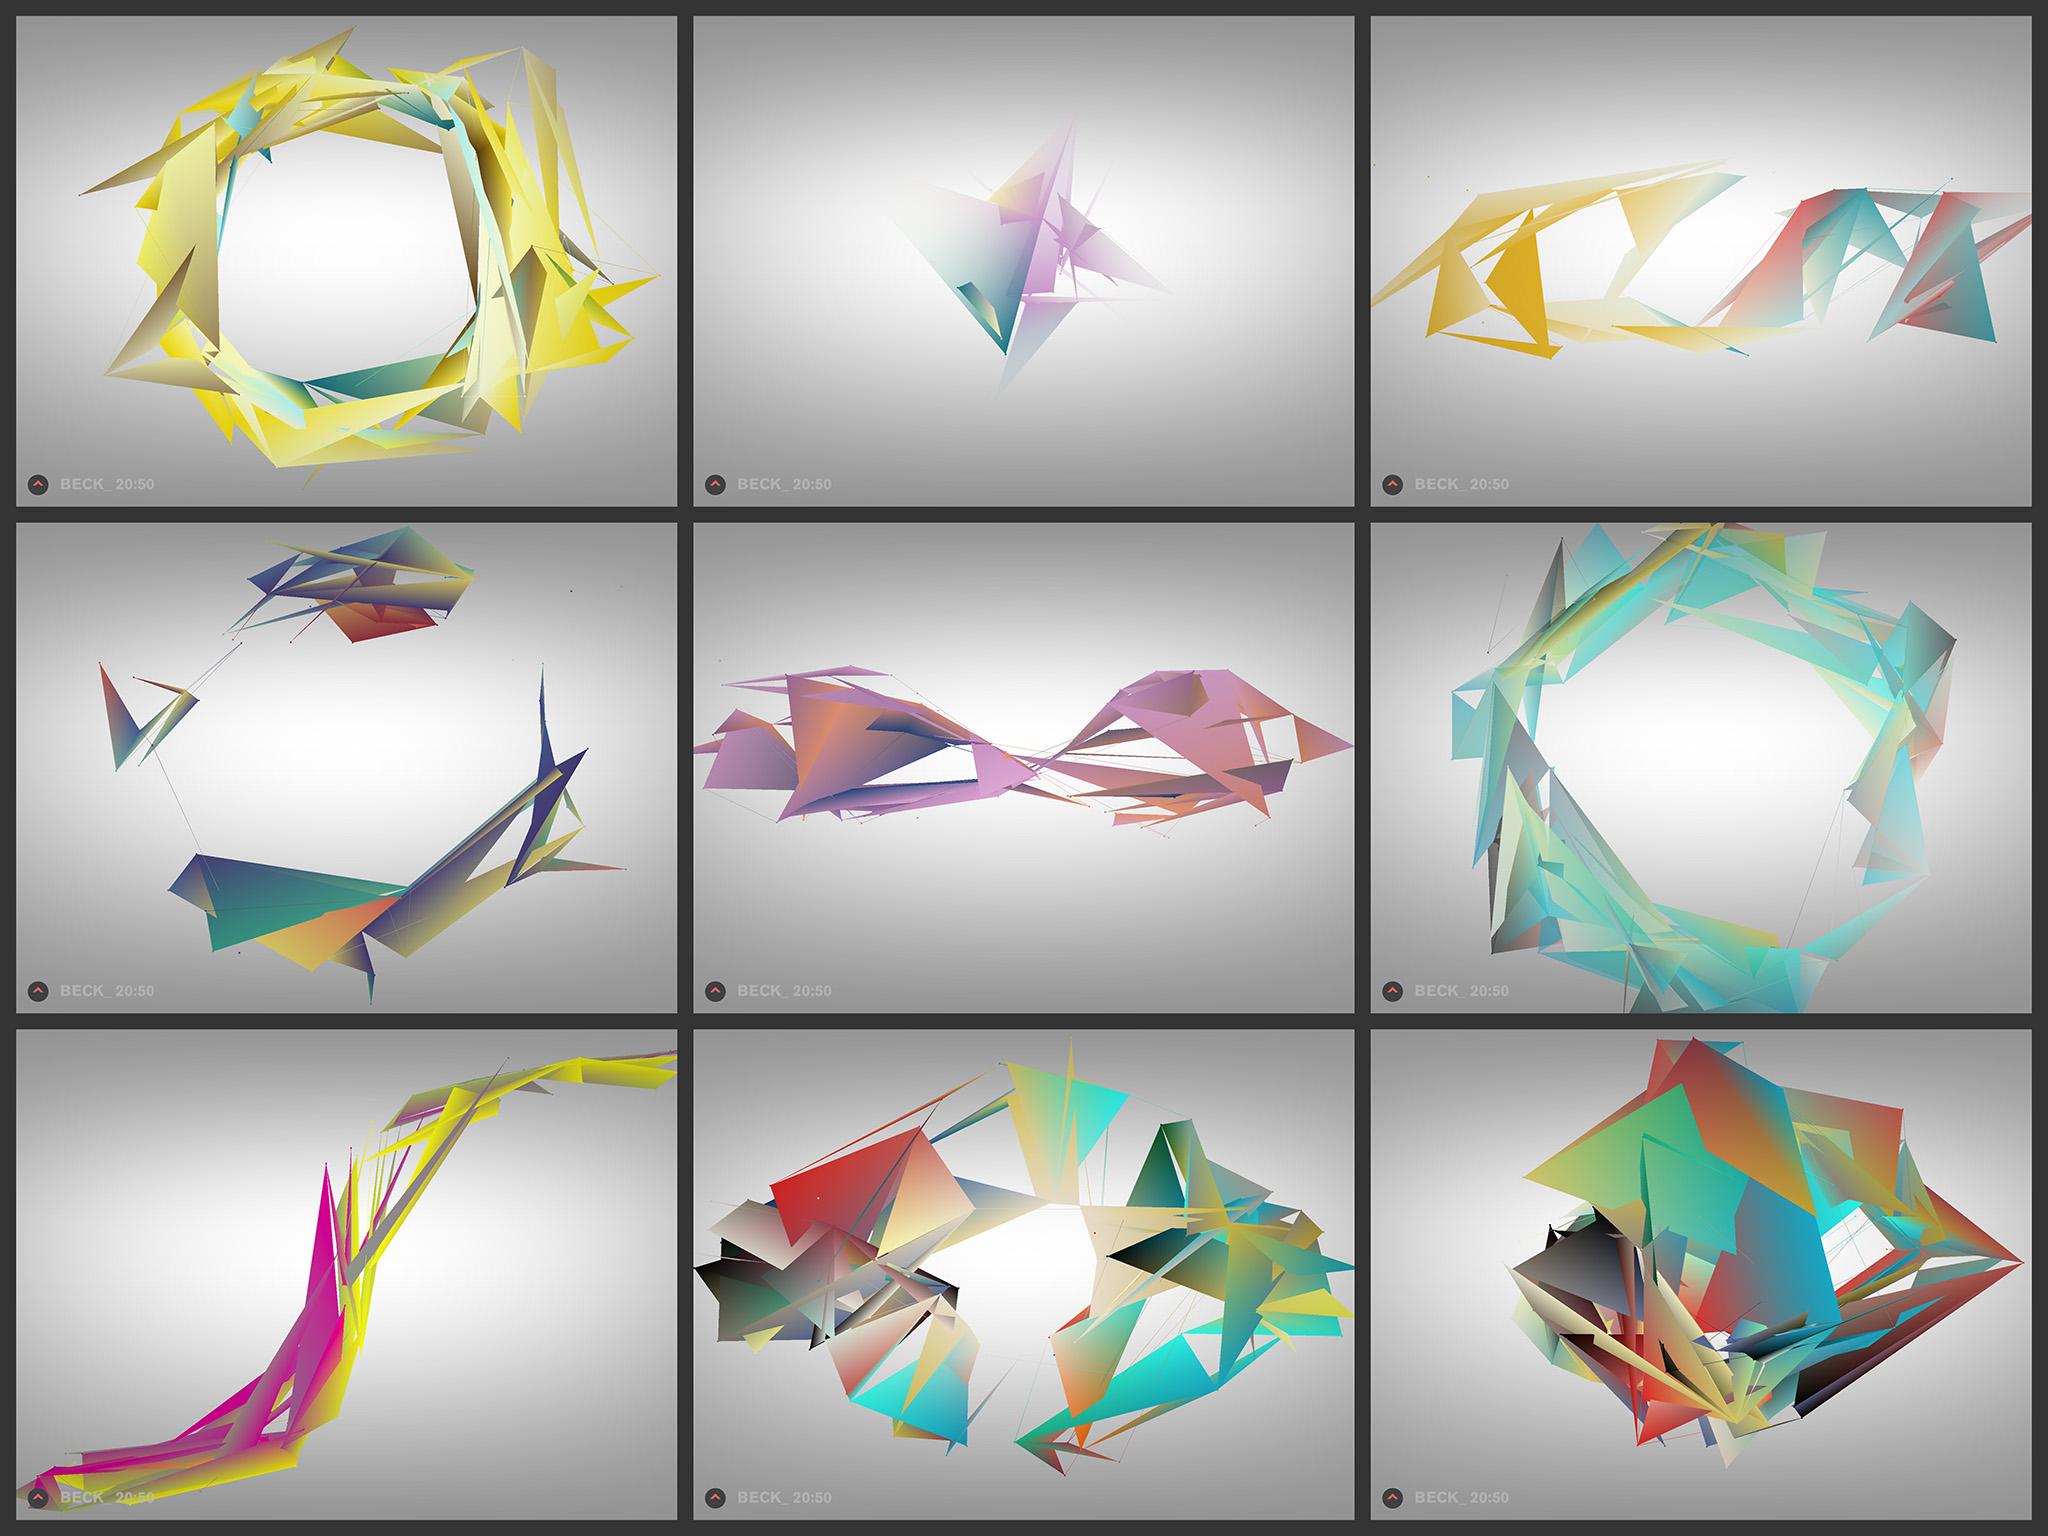 glass-iPad-Beck-comp-2048x1536.jpg